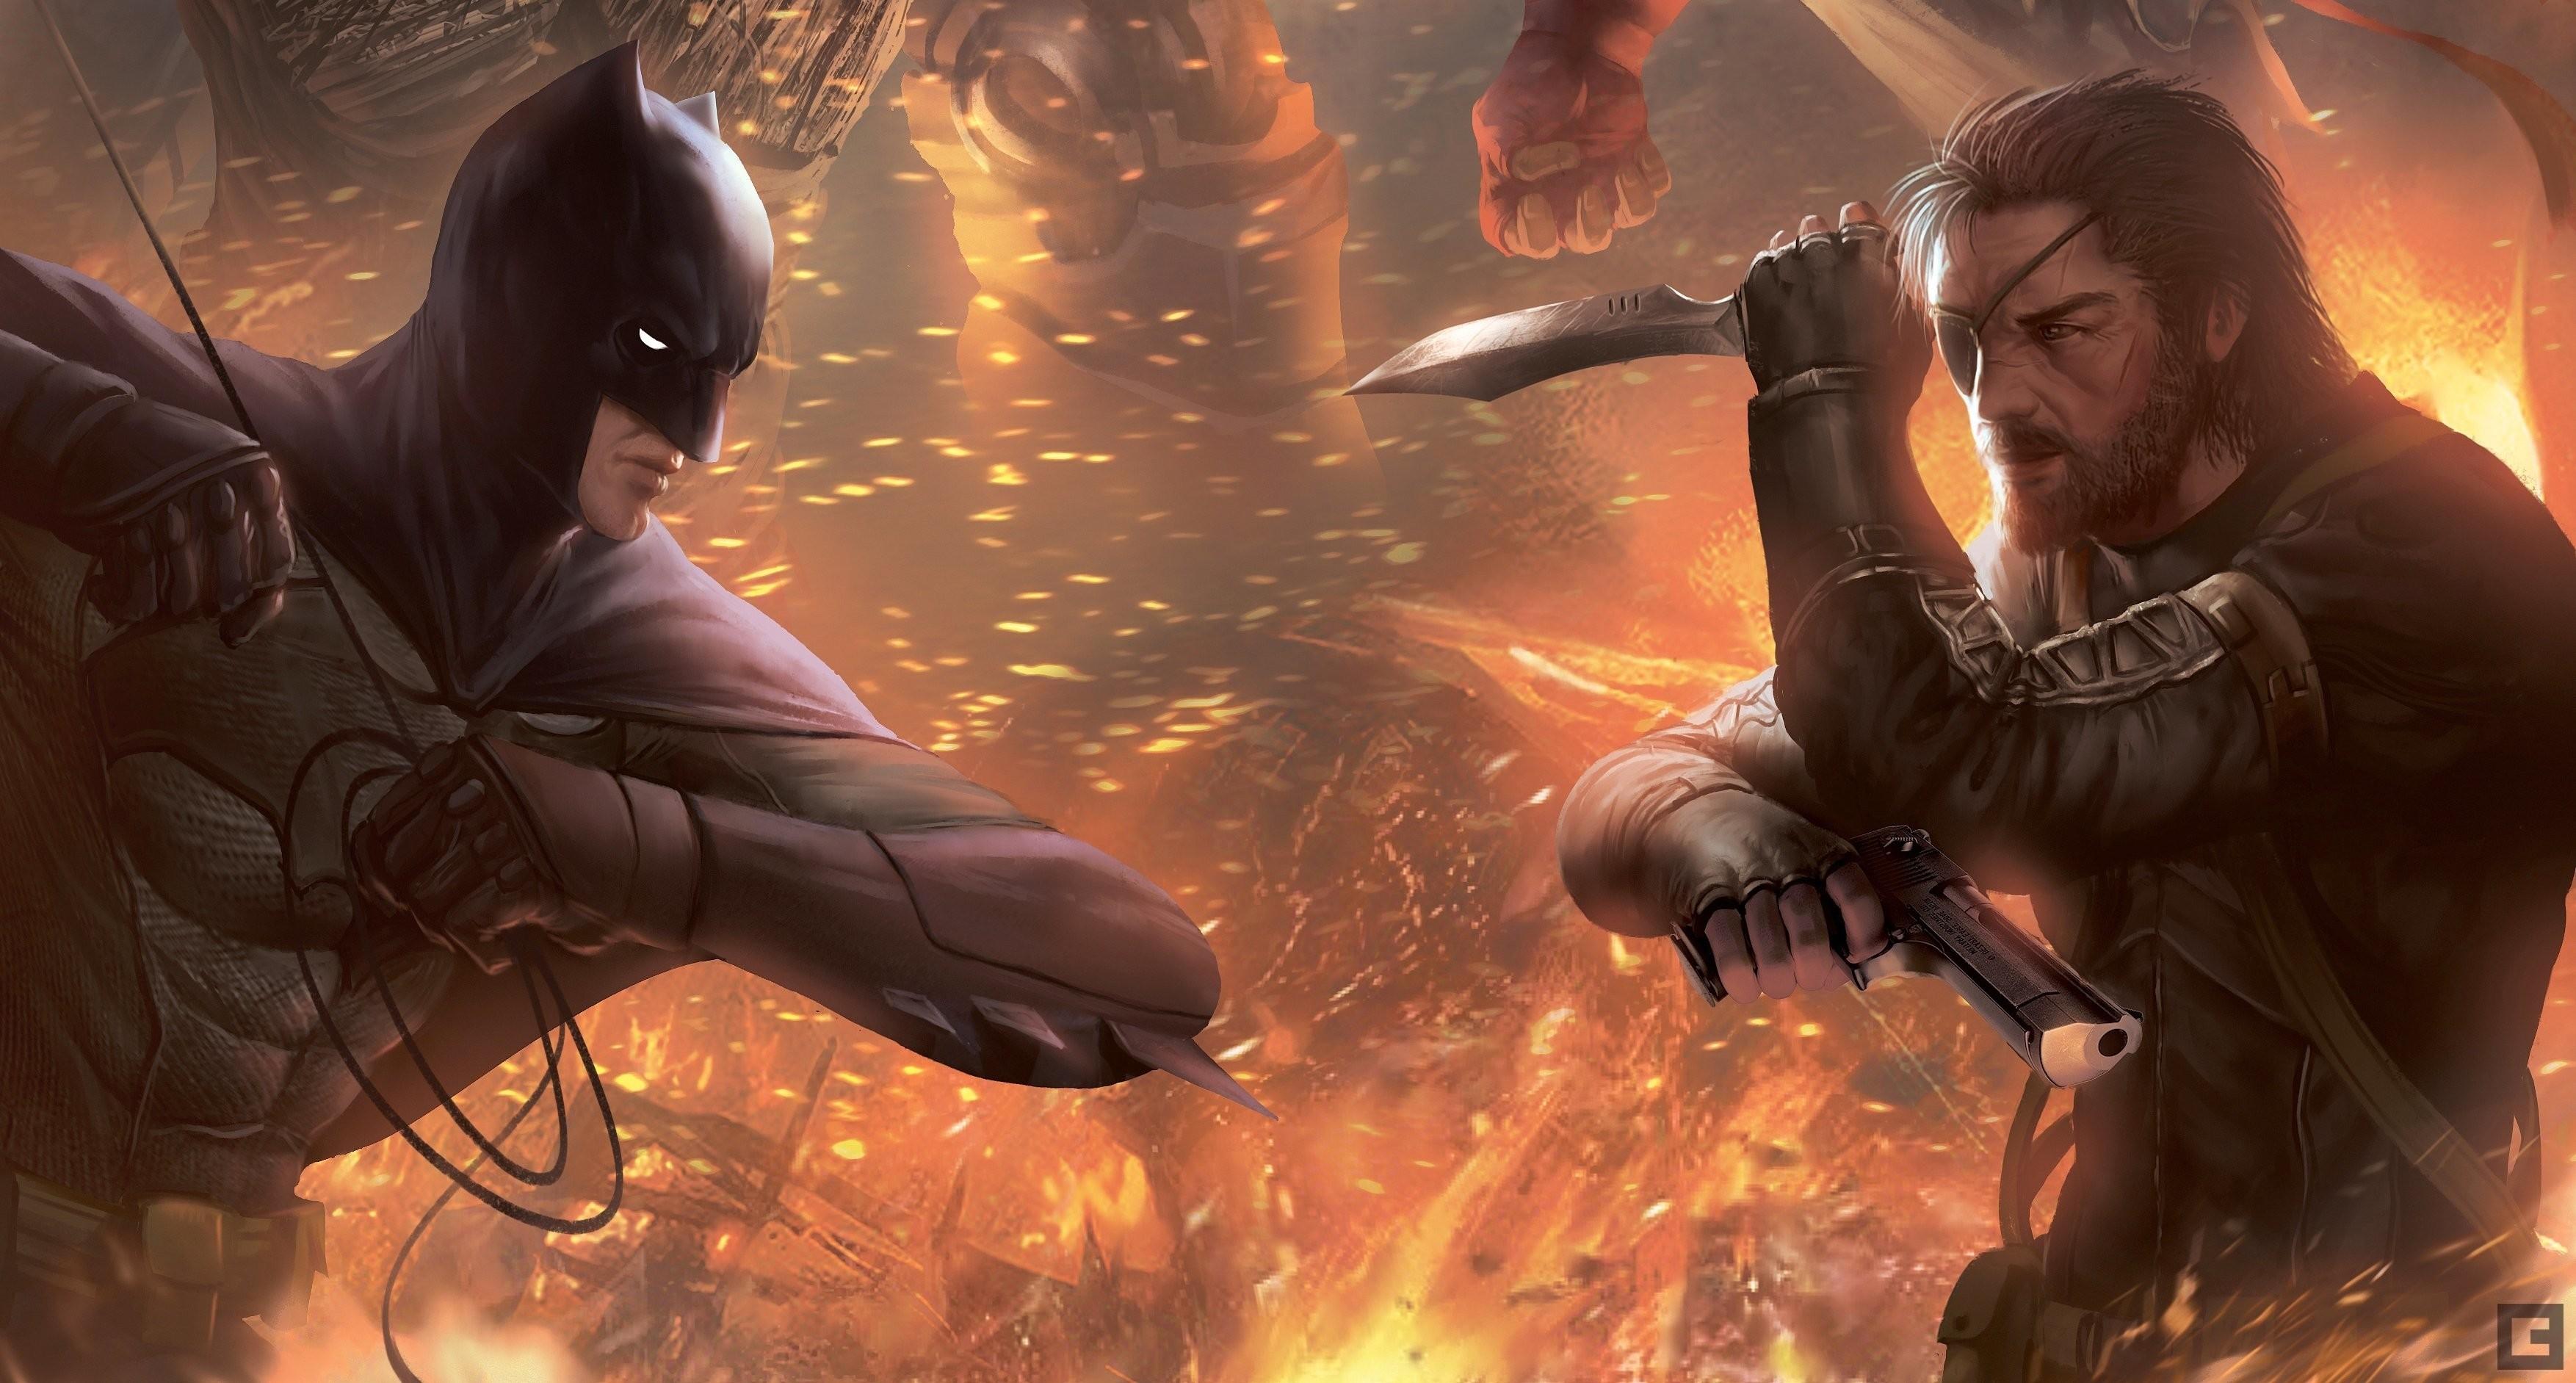 Metal Gear Batman hero Battle Big Boss John Jack Naked Snake Punished Snake  Venom Snake Snake Fantasy superhero ark knight wallpaper | |  799432 | …